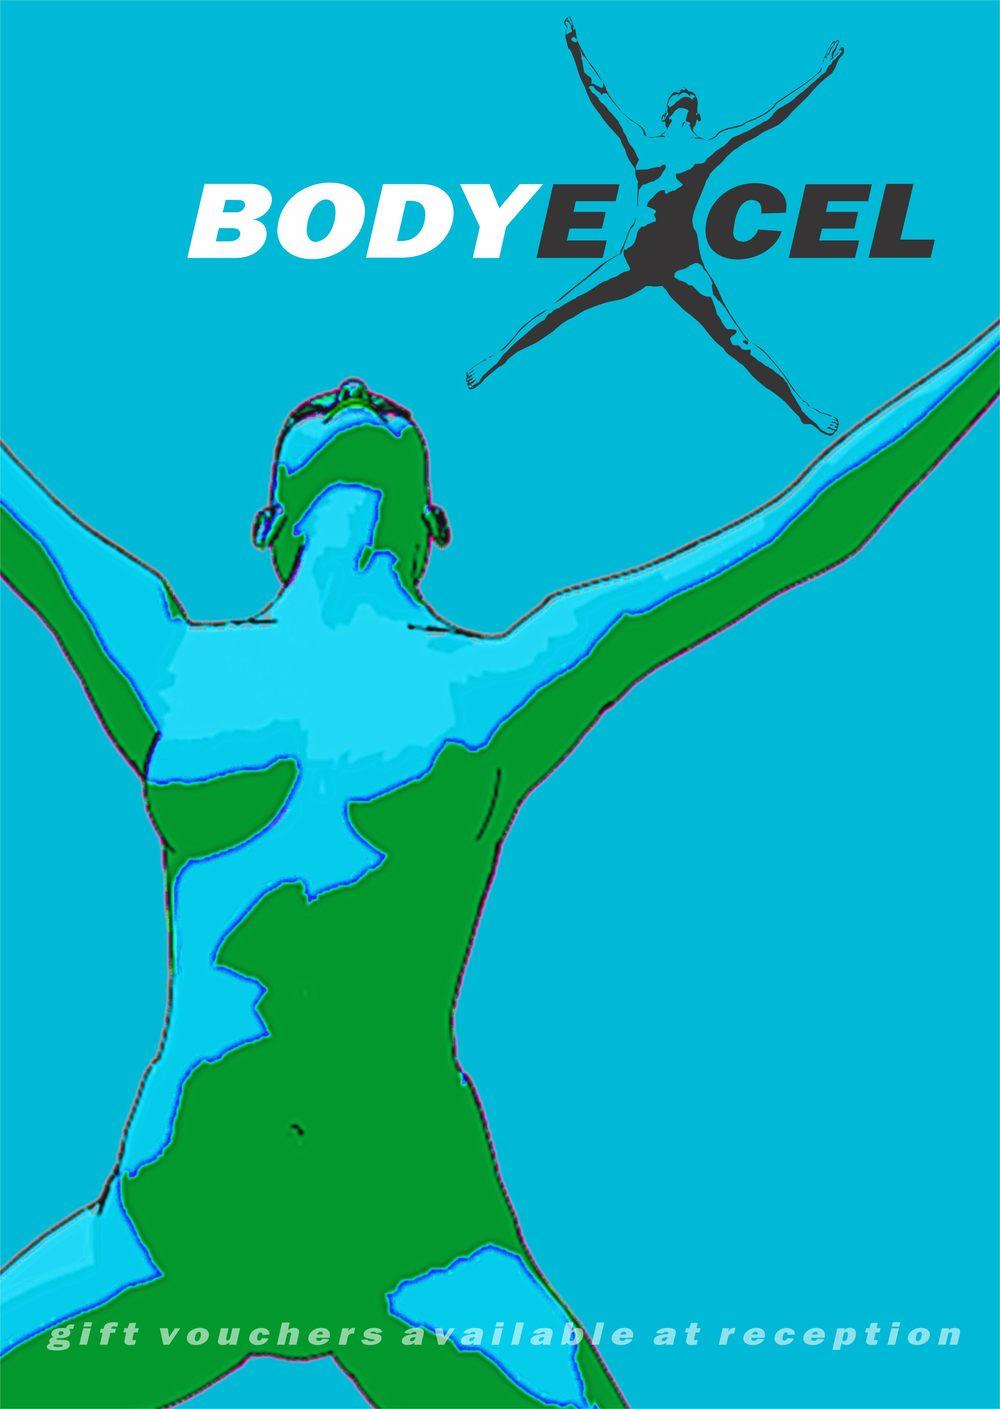 body_excel_poster.jpg